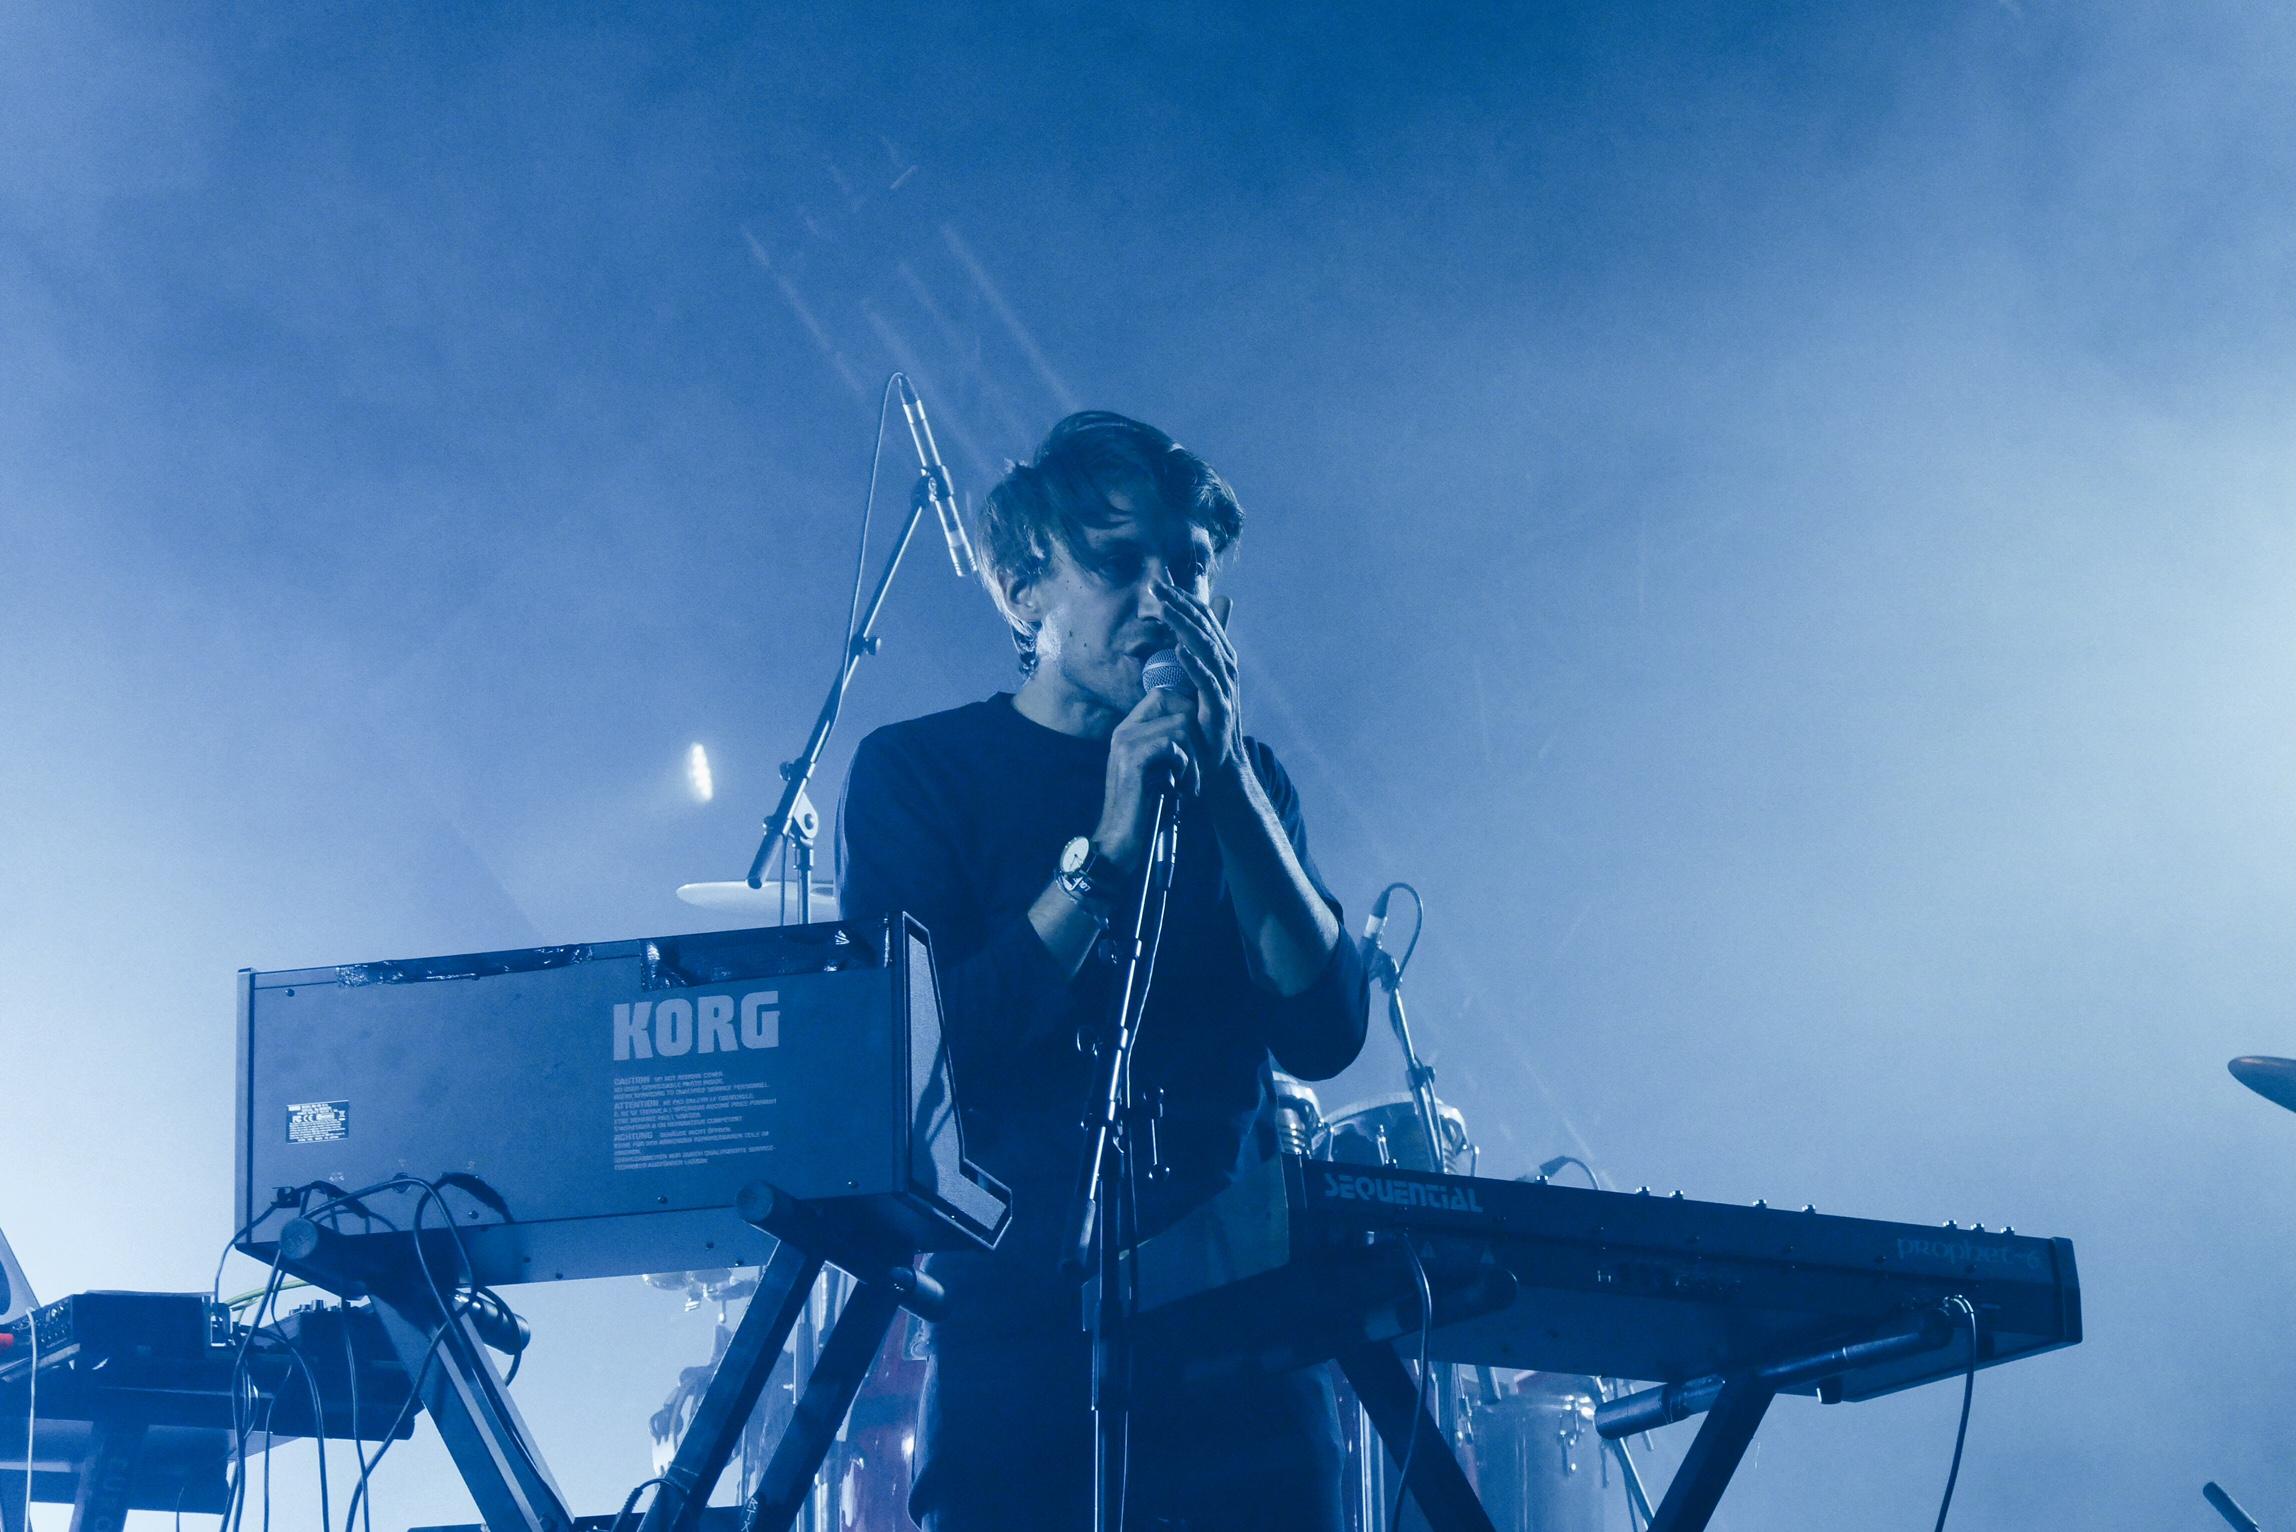 Yuksek-live-concert-Trans-Musicales-2016-music-festival-sweet-addiction-EP-photo-usofparis-blog